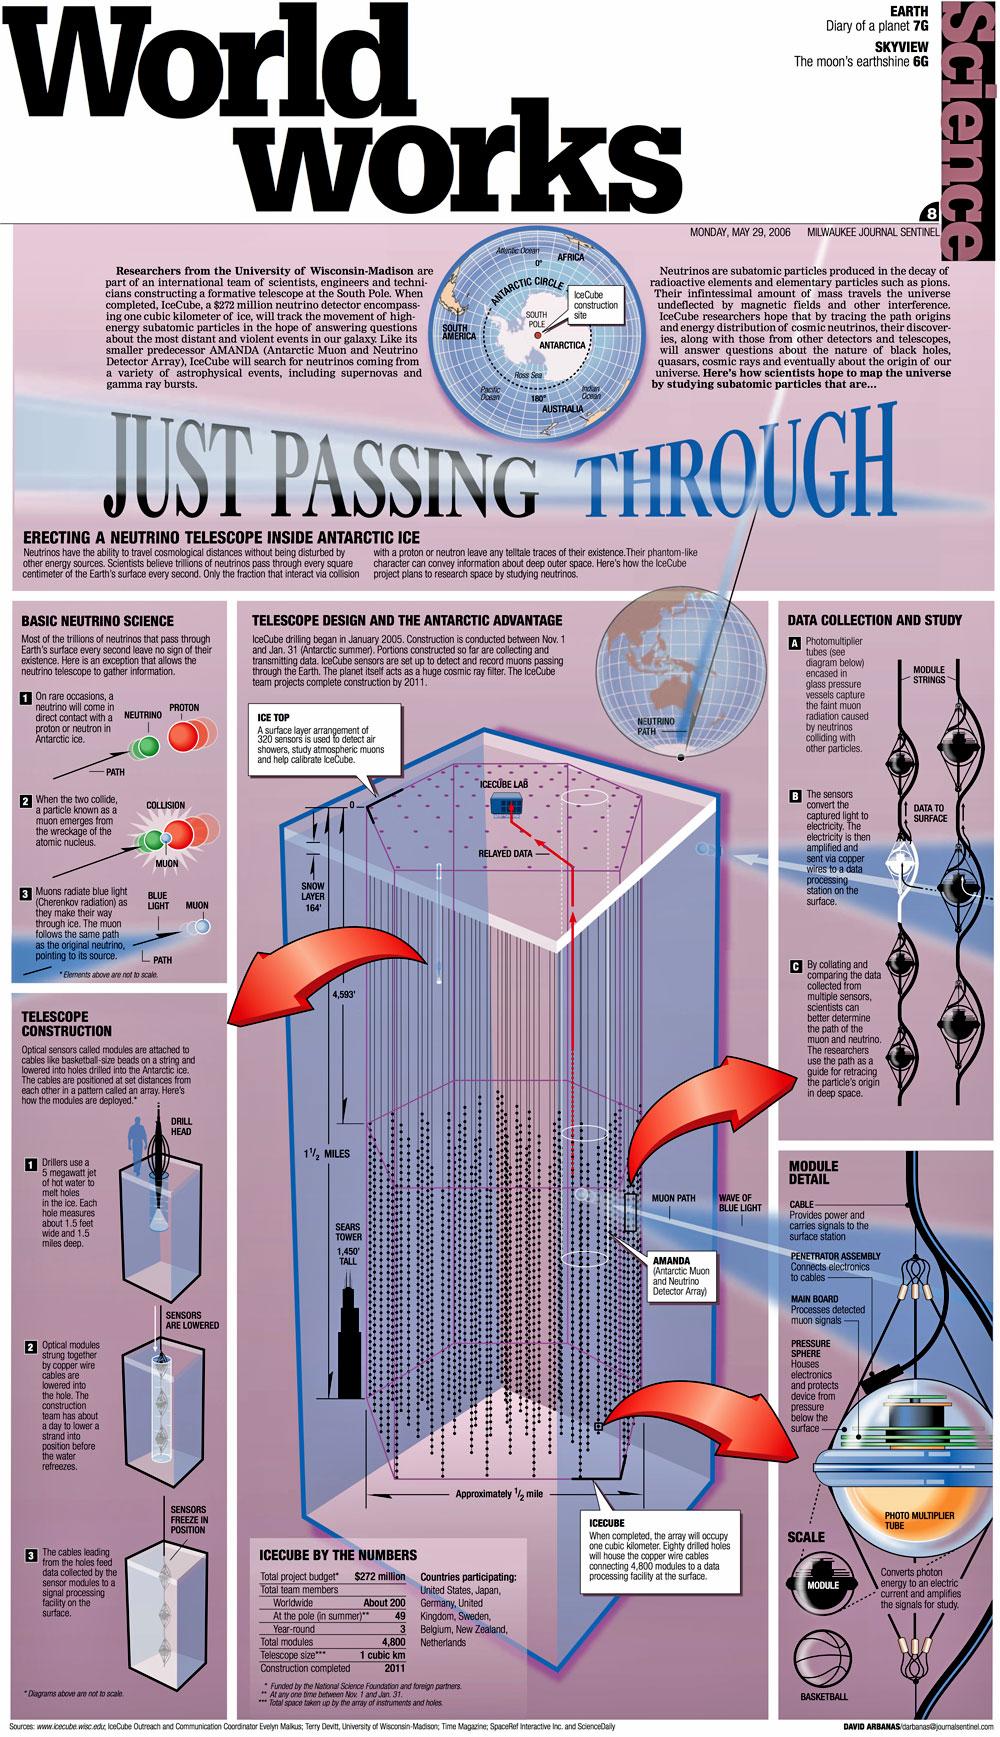 IceCube Neutrino Observatory - AMANDA ProjectIcecube Neutrino Observatory White Book